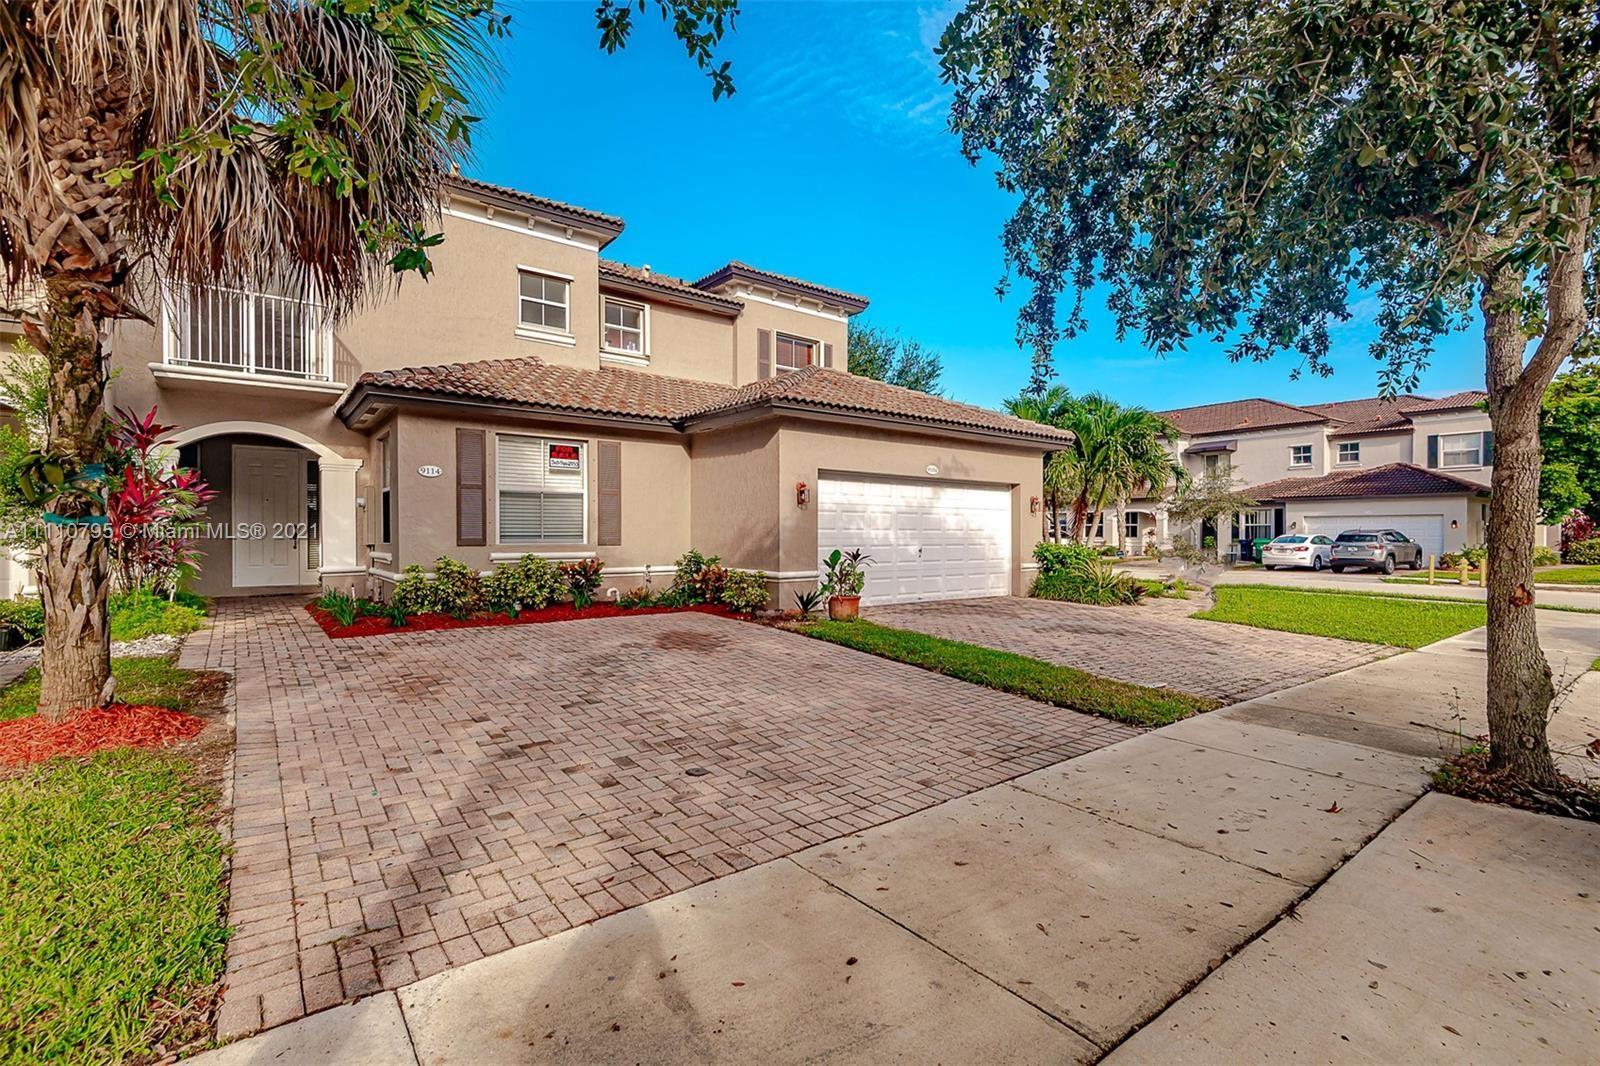 9114 SW 152nd Path, Miami, FL 33196 - #: A11110795